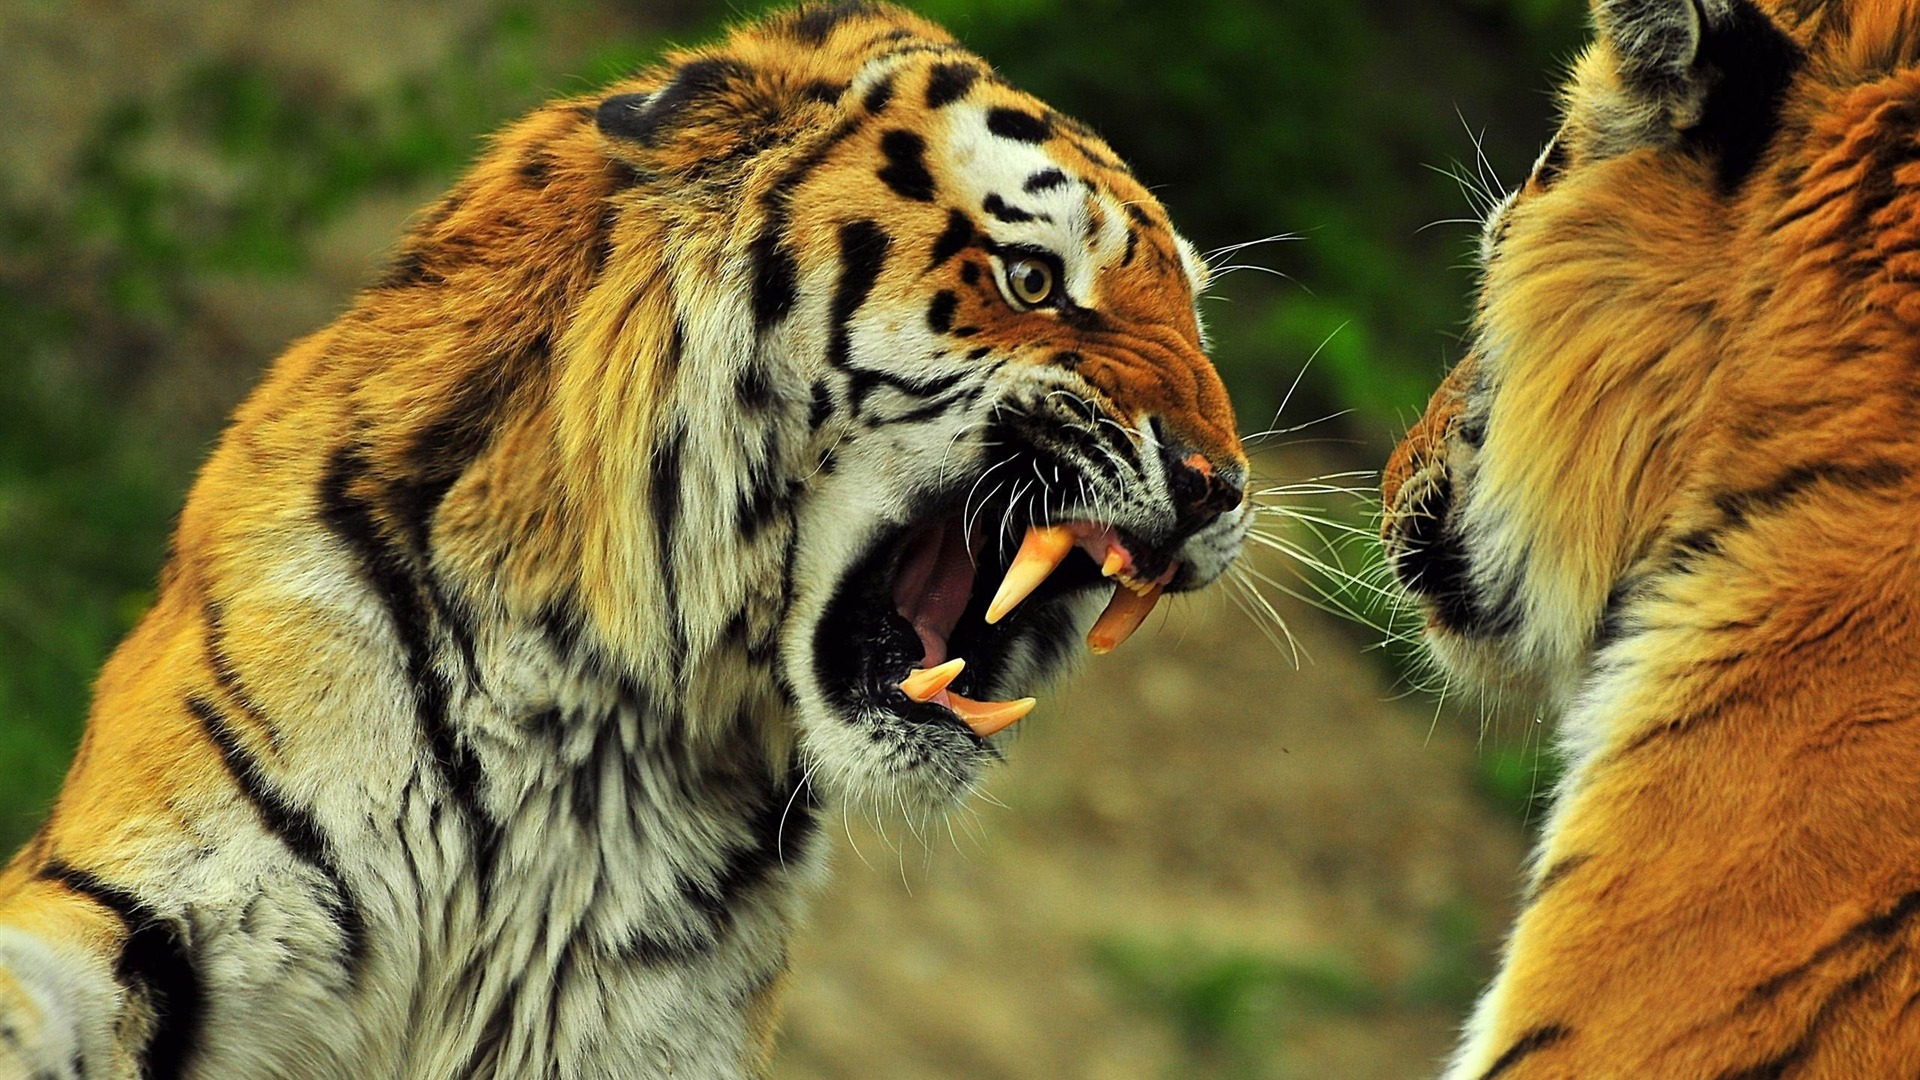 Wild Animal Desktop Wallpaper Wallpapersafari